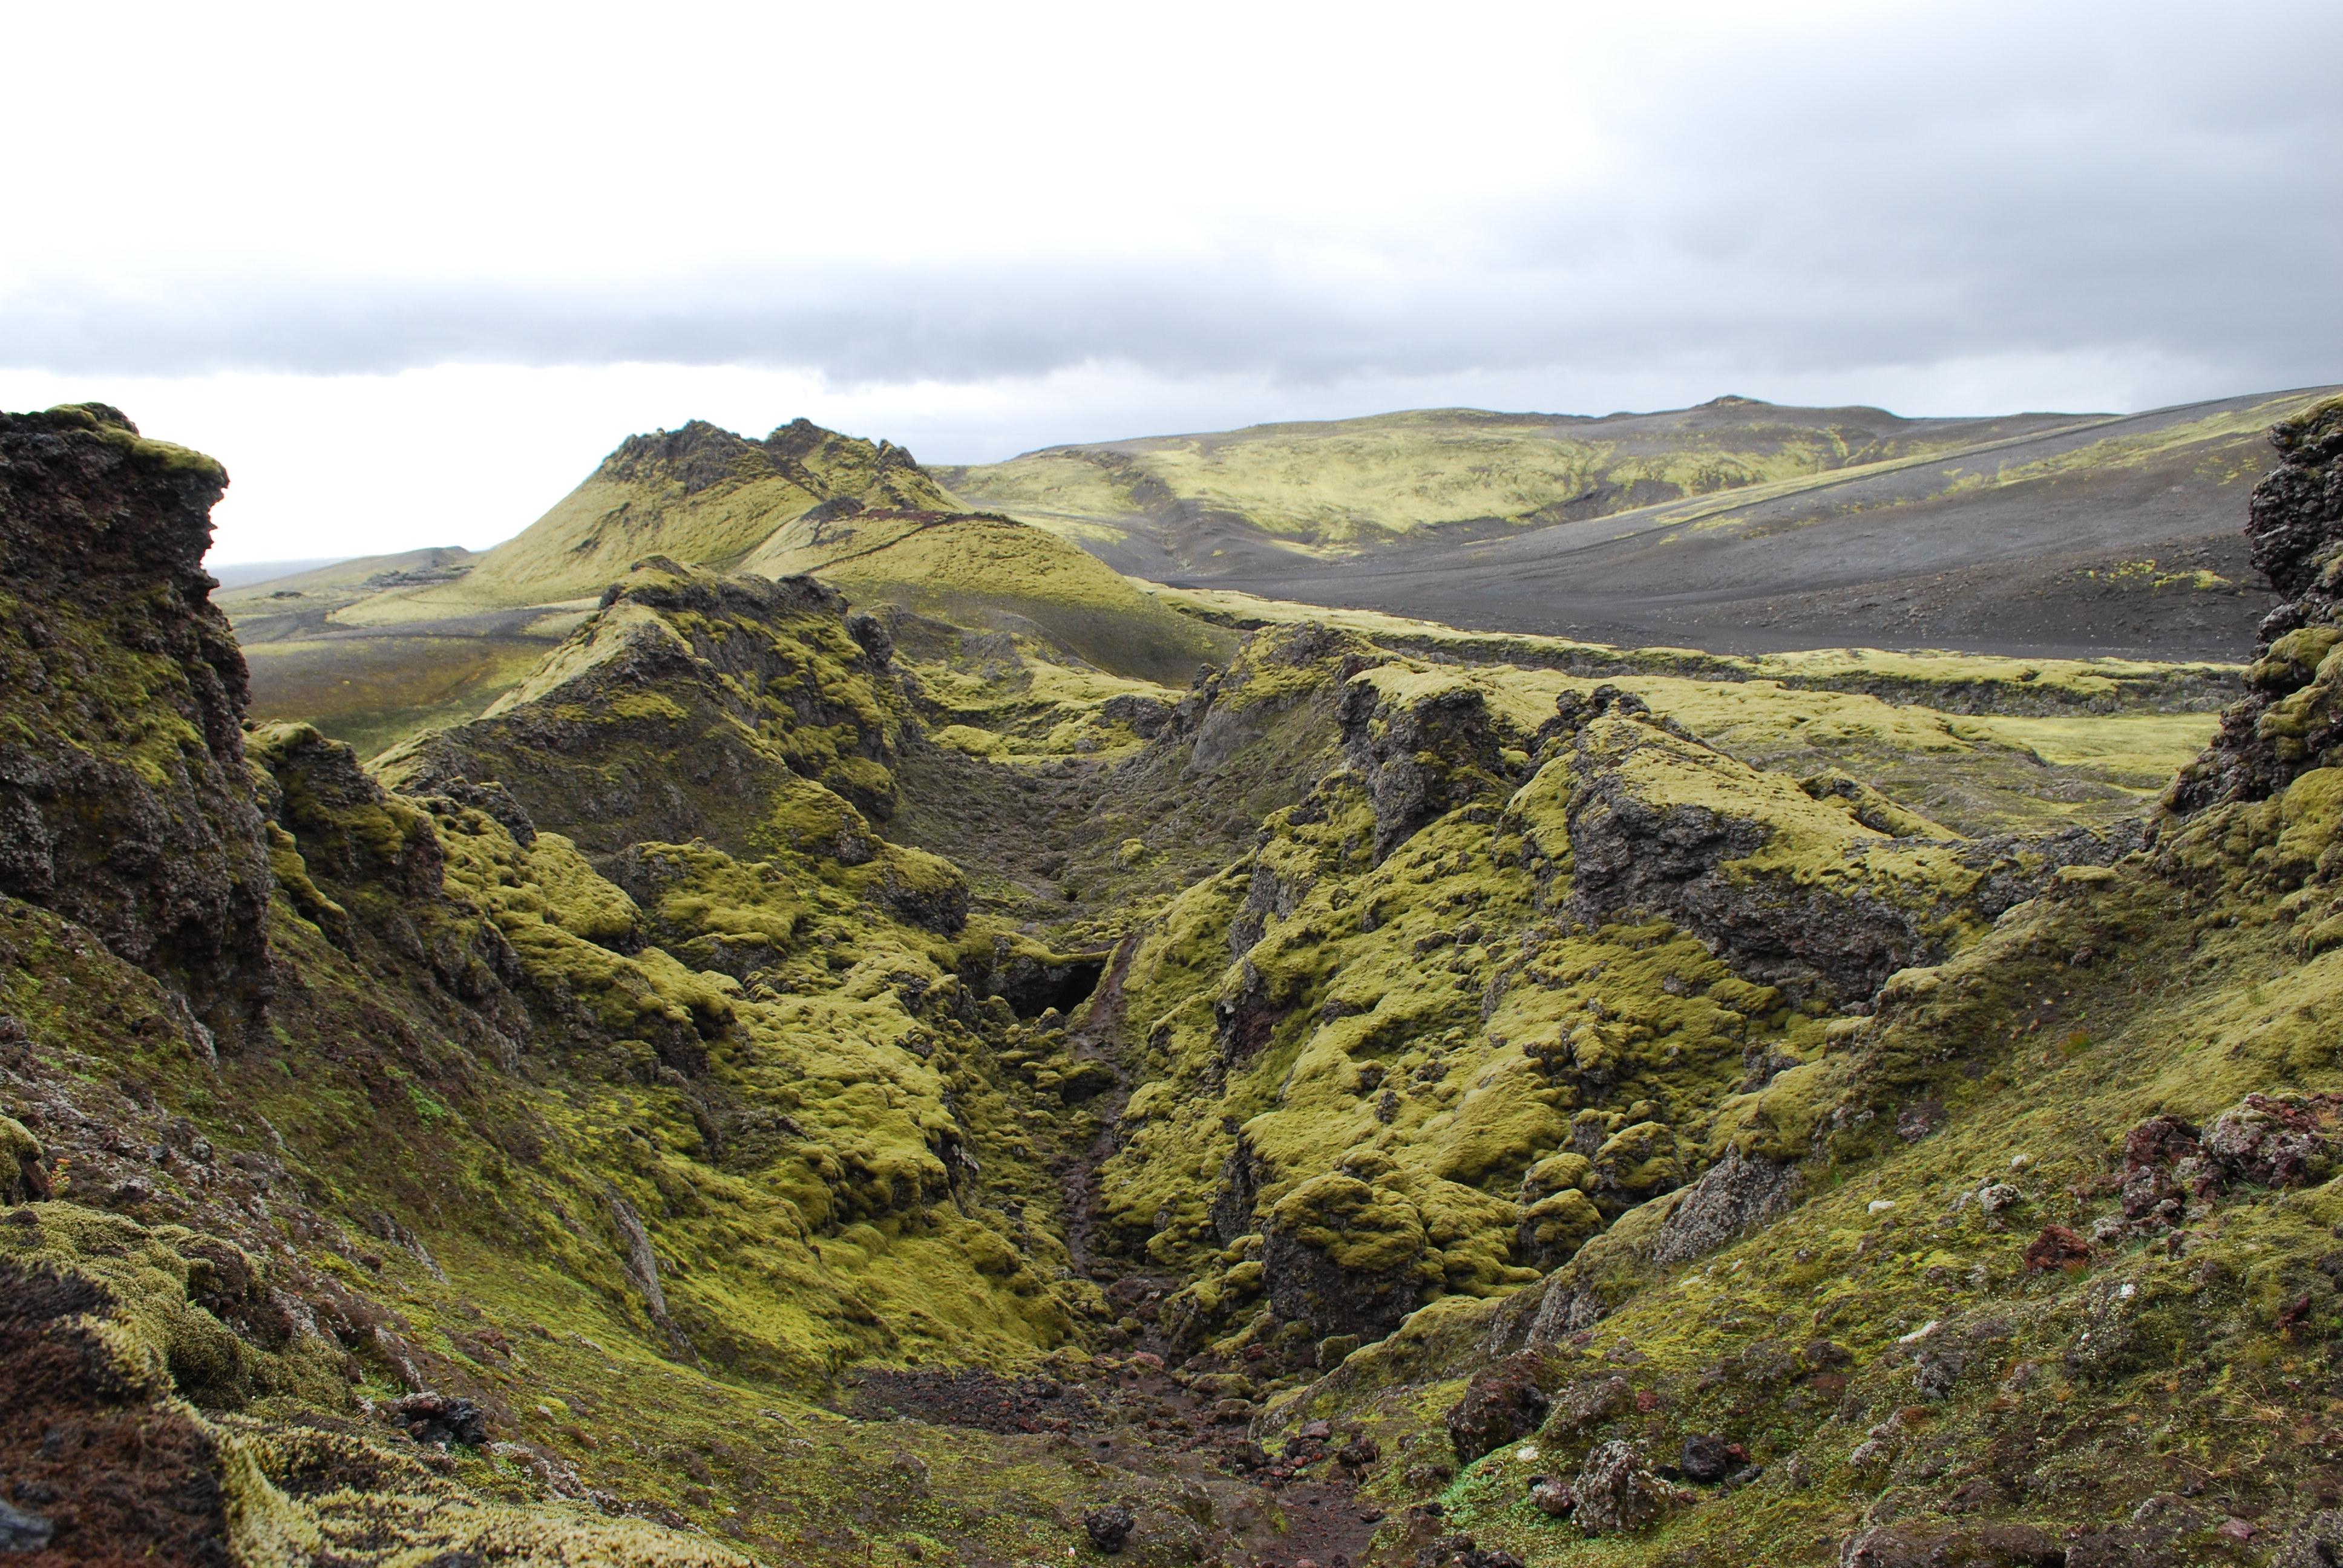 Vulkanismus – Vulkanische Vollformen